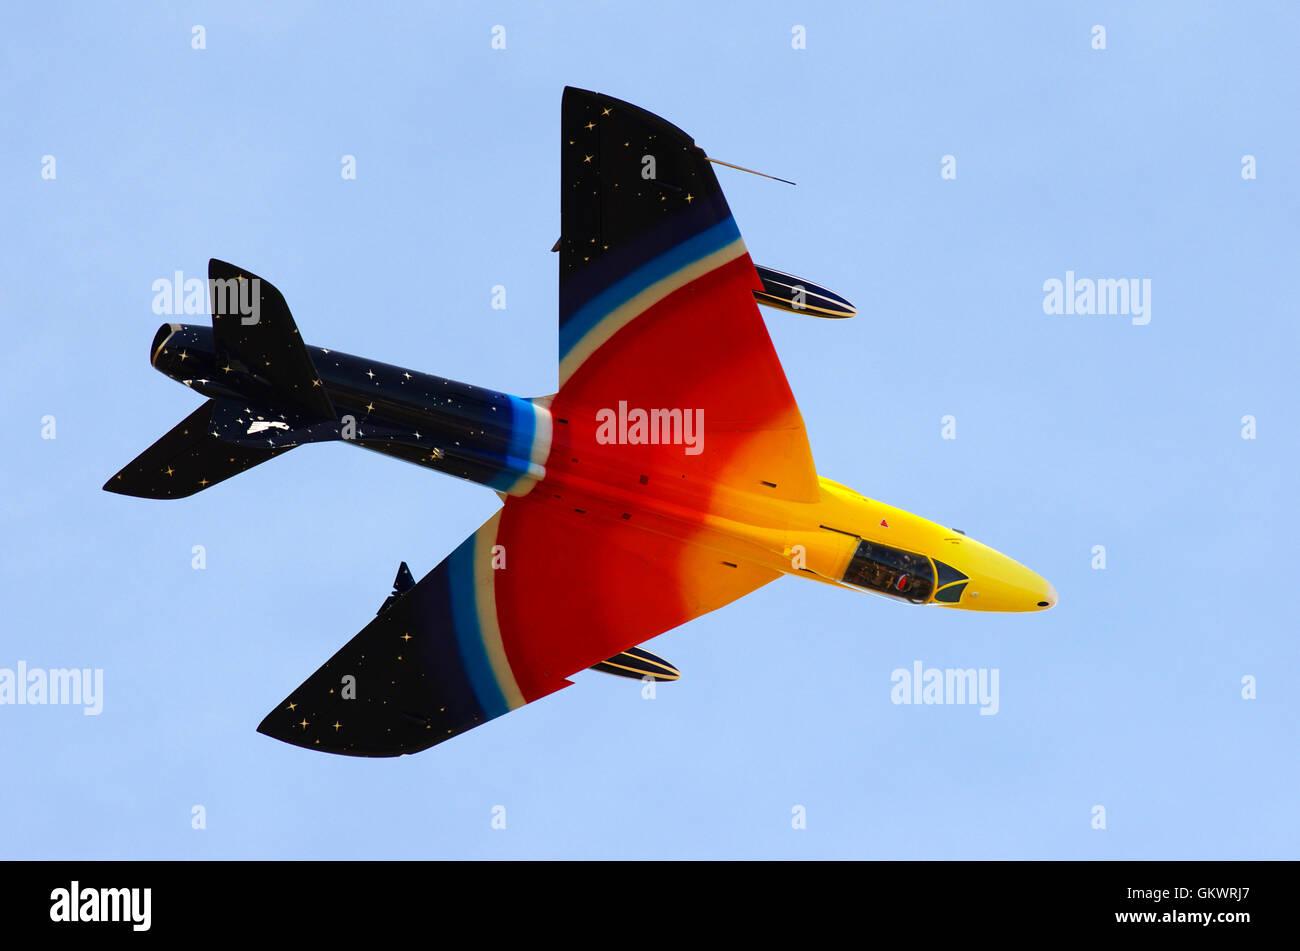 Hawker Hunter Miss Demeanour, Stock Photo